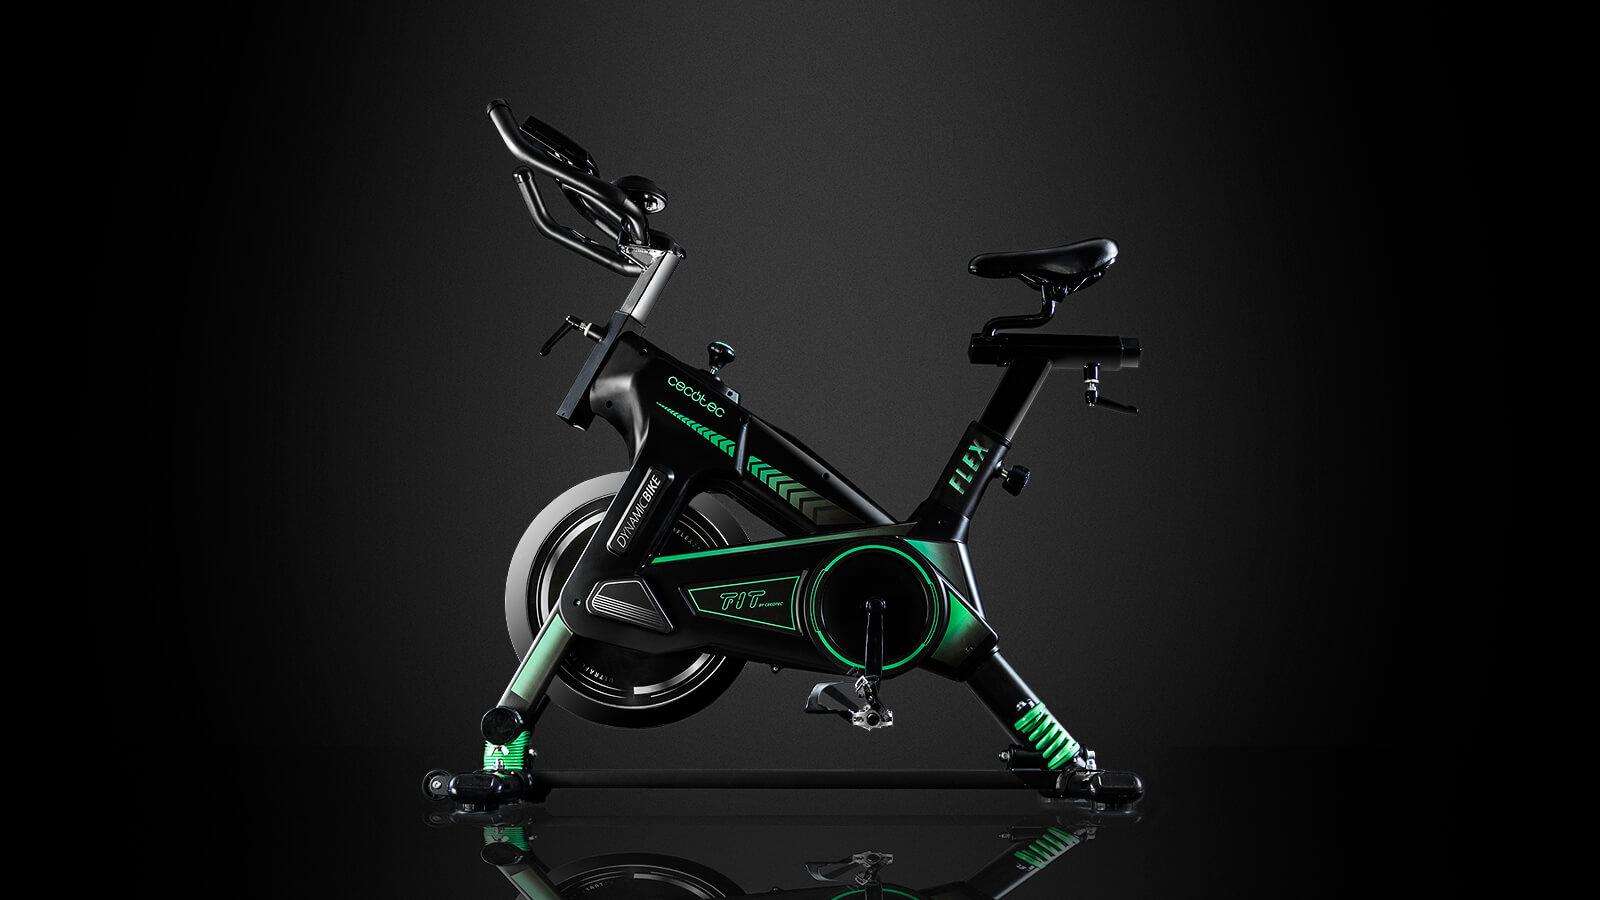 Bicicleta de spinning de la marca Cecotec